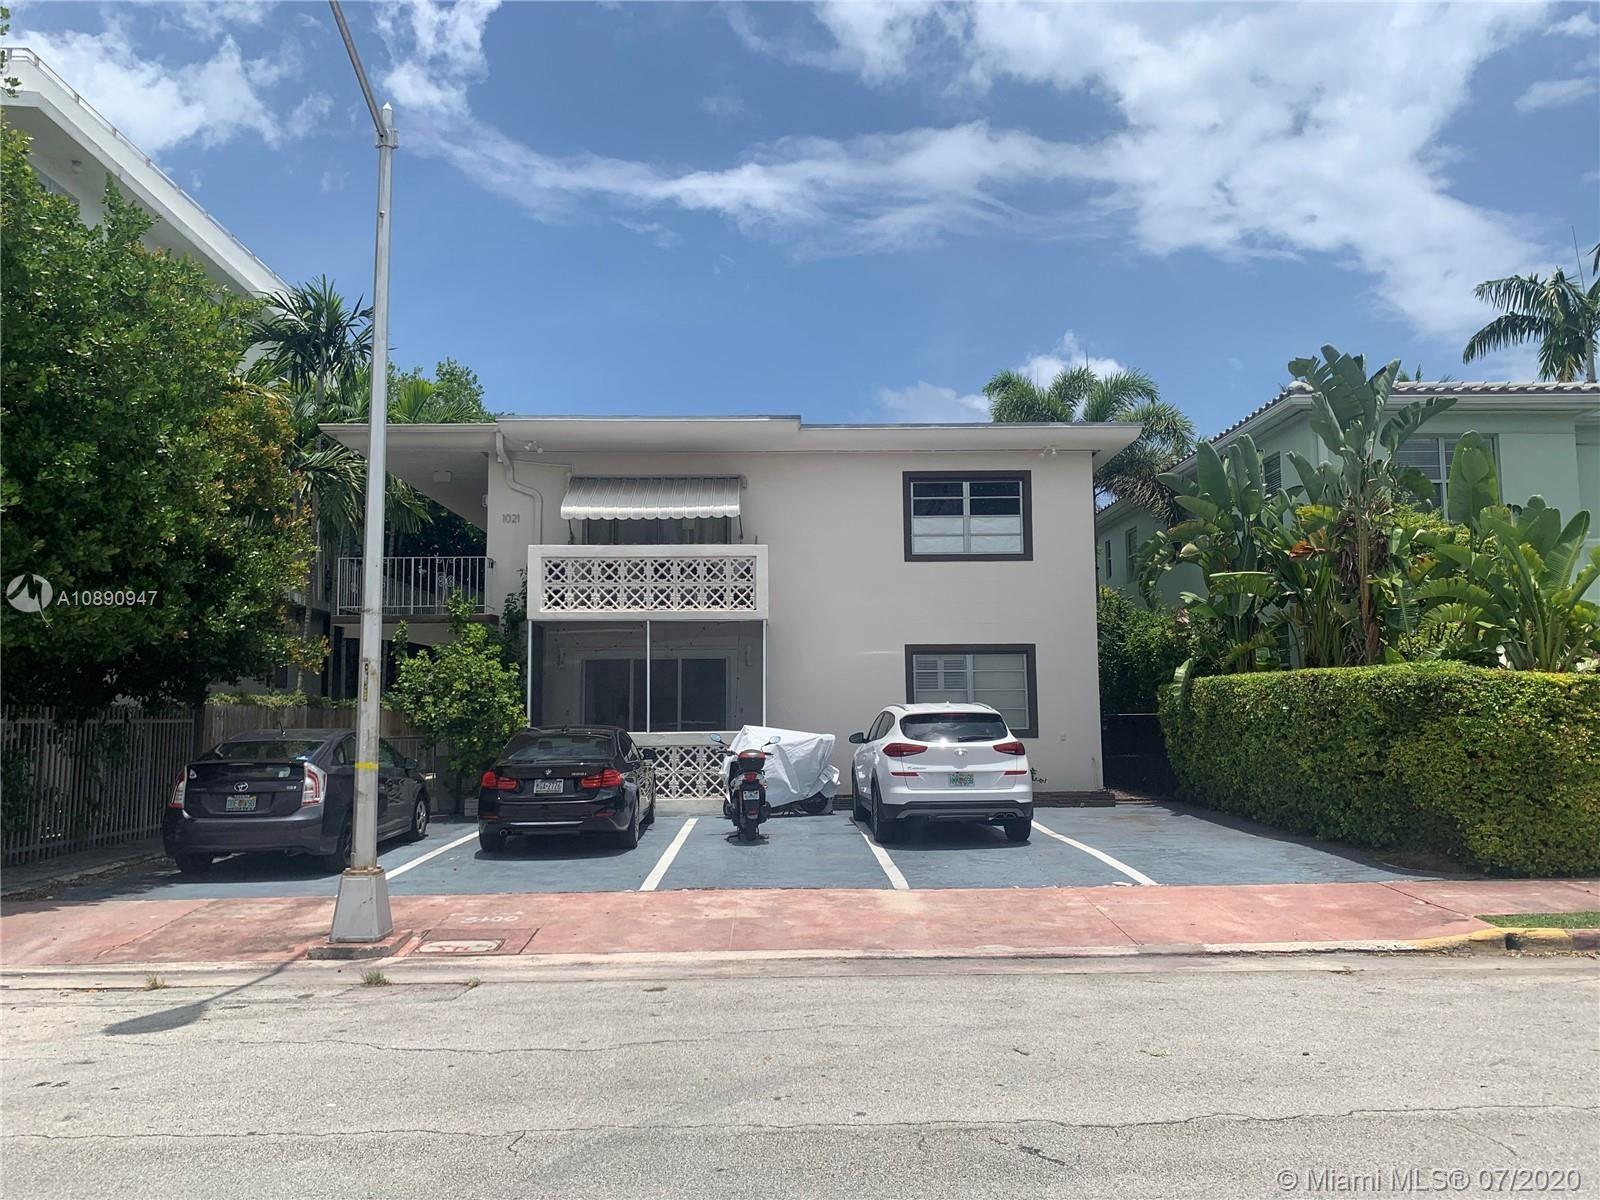 1021 Michigan Ave #10, Miami Beach, FL 33139 - #: A10890947